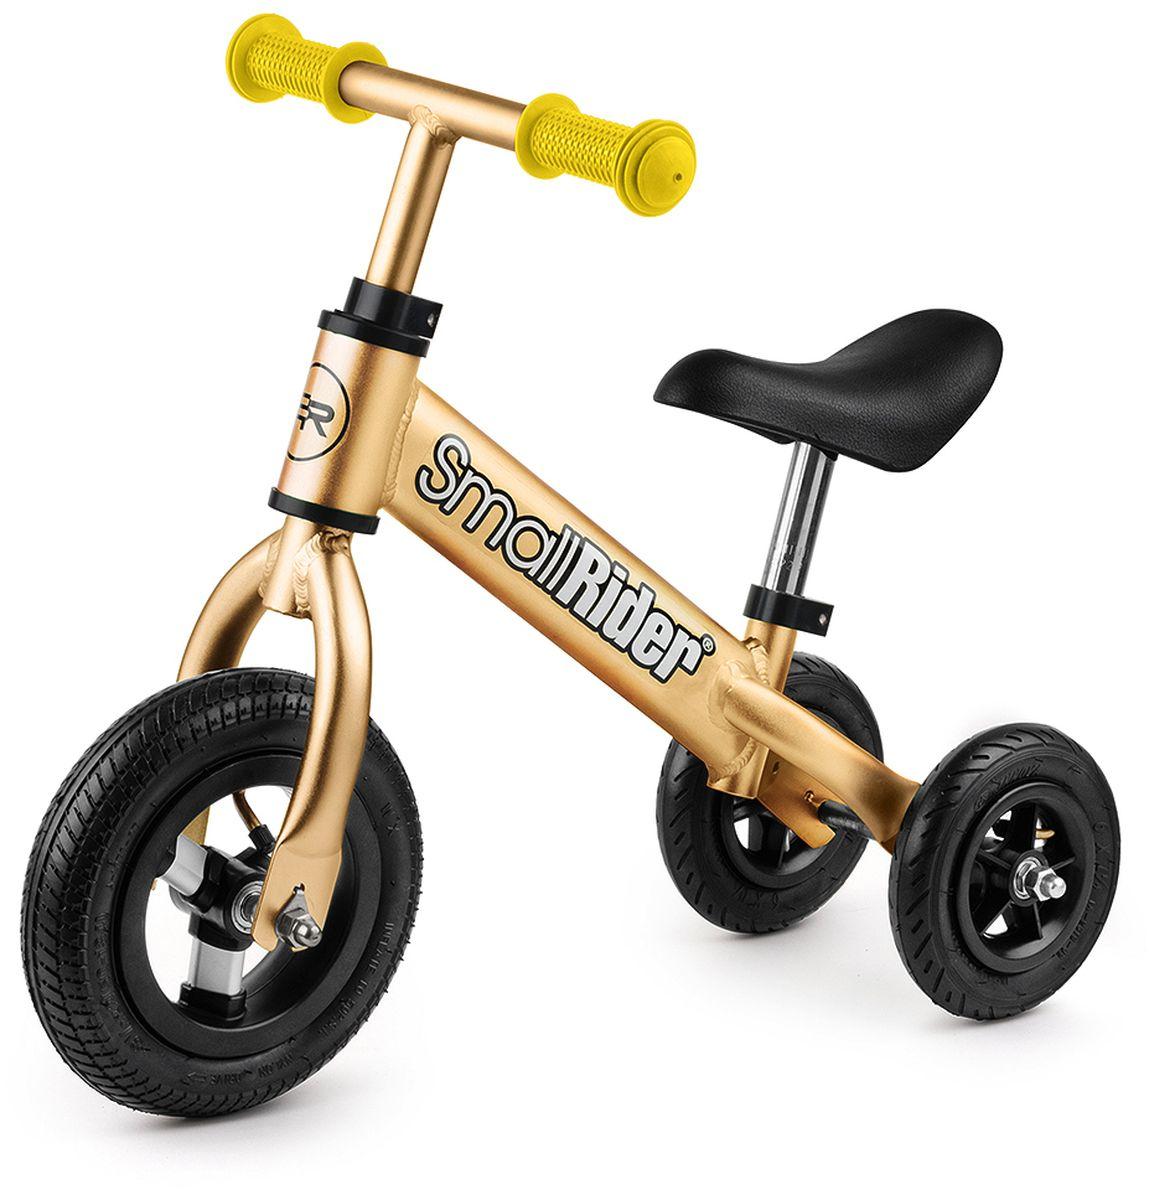 Small Rider Беговел-каталка для малышей Jimmy цвет золотой -  Беговелы